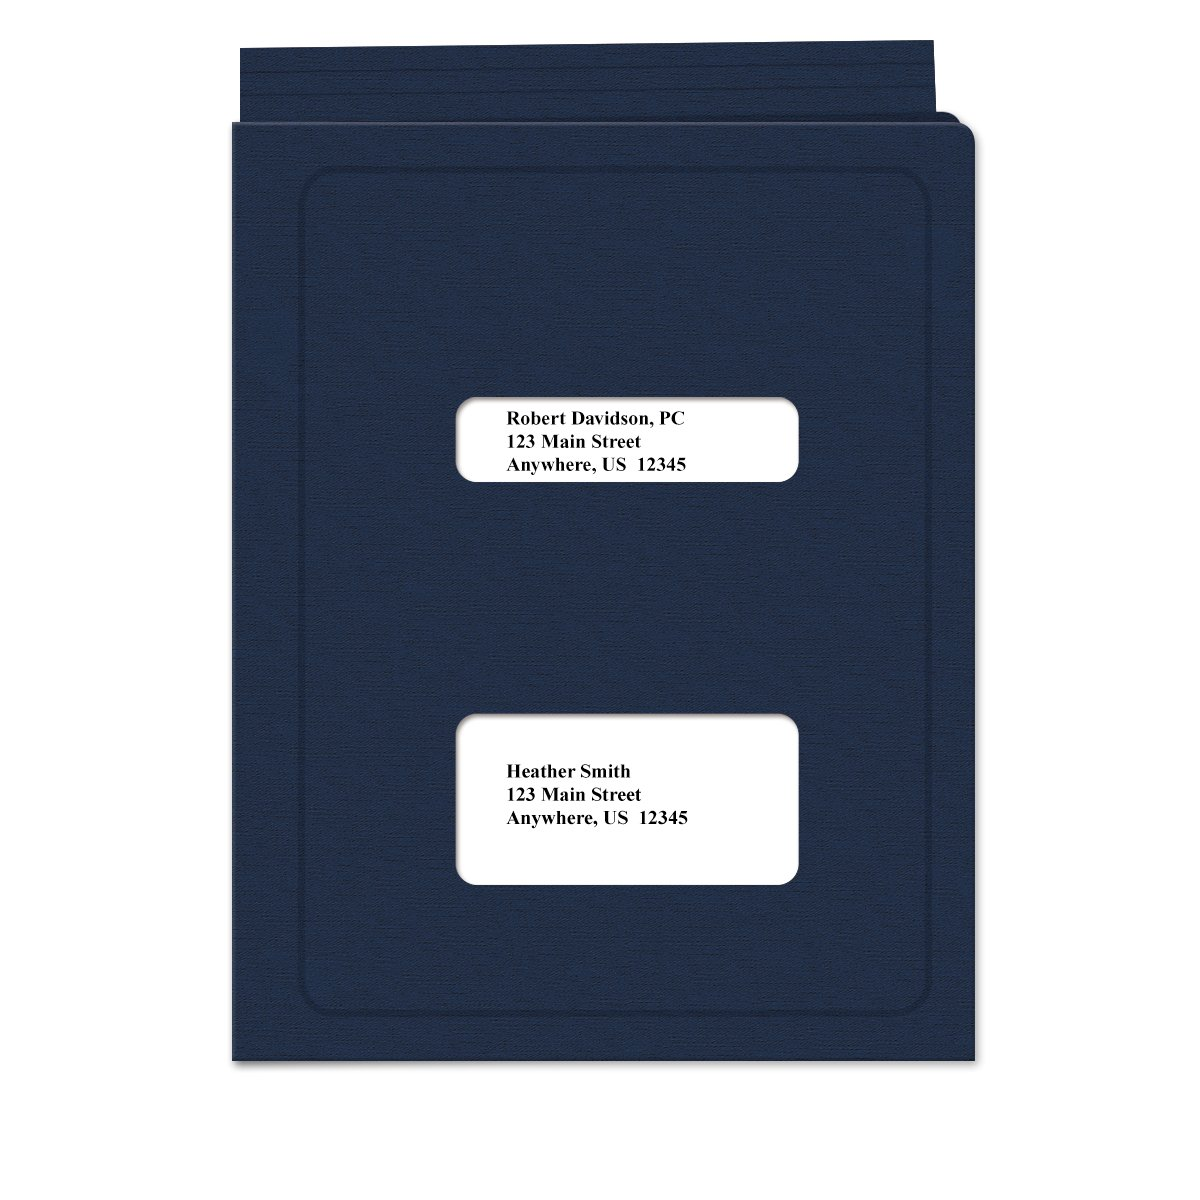 Double Window Tax Return Software Folder - Top-Tabbed - 50 Pack